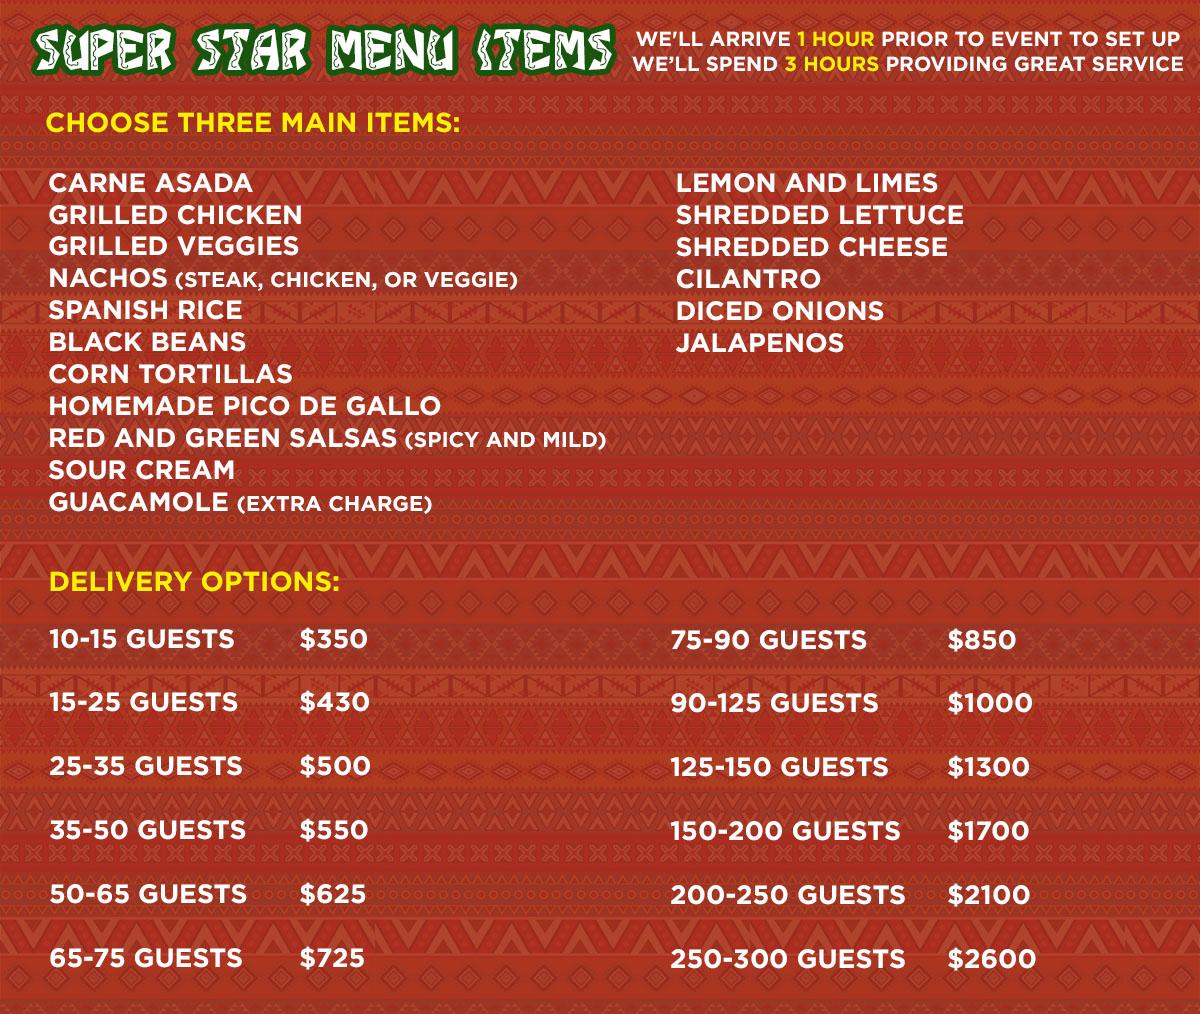 bt-menus-superstar